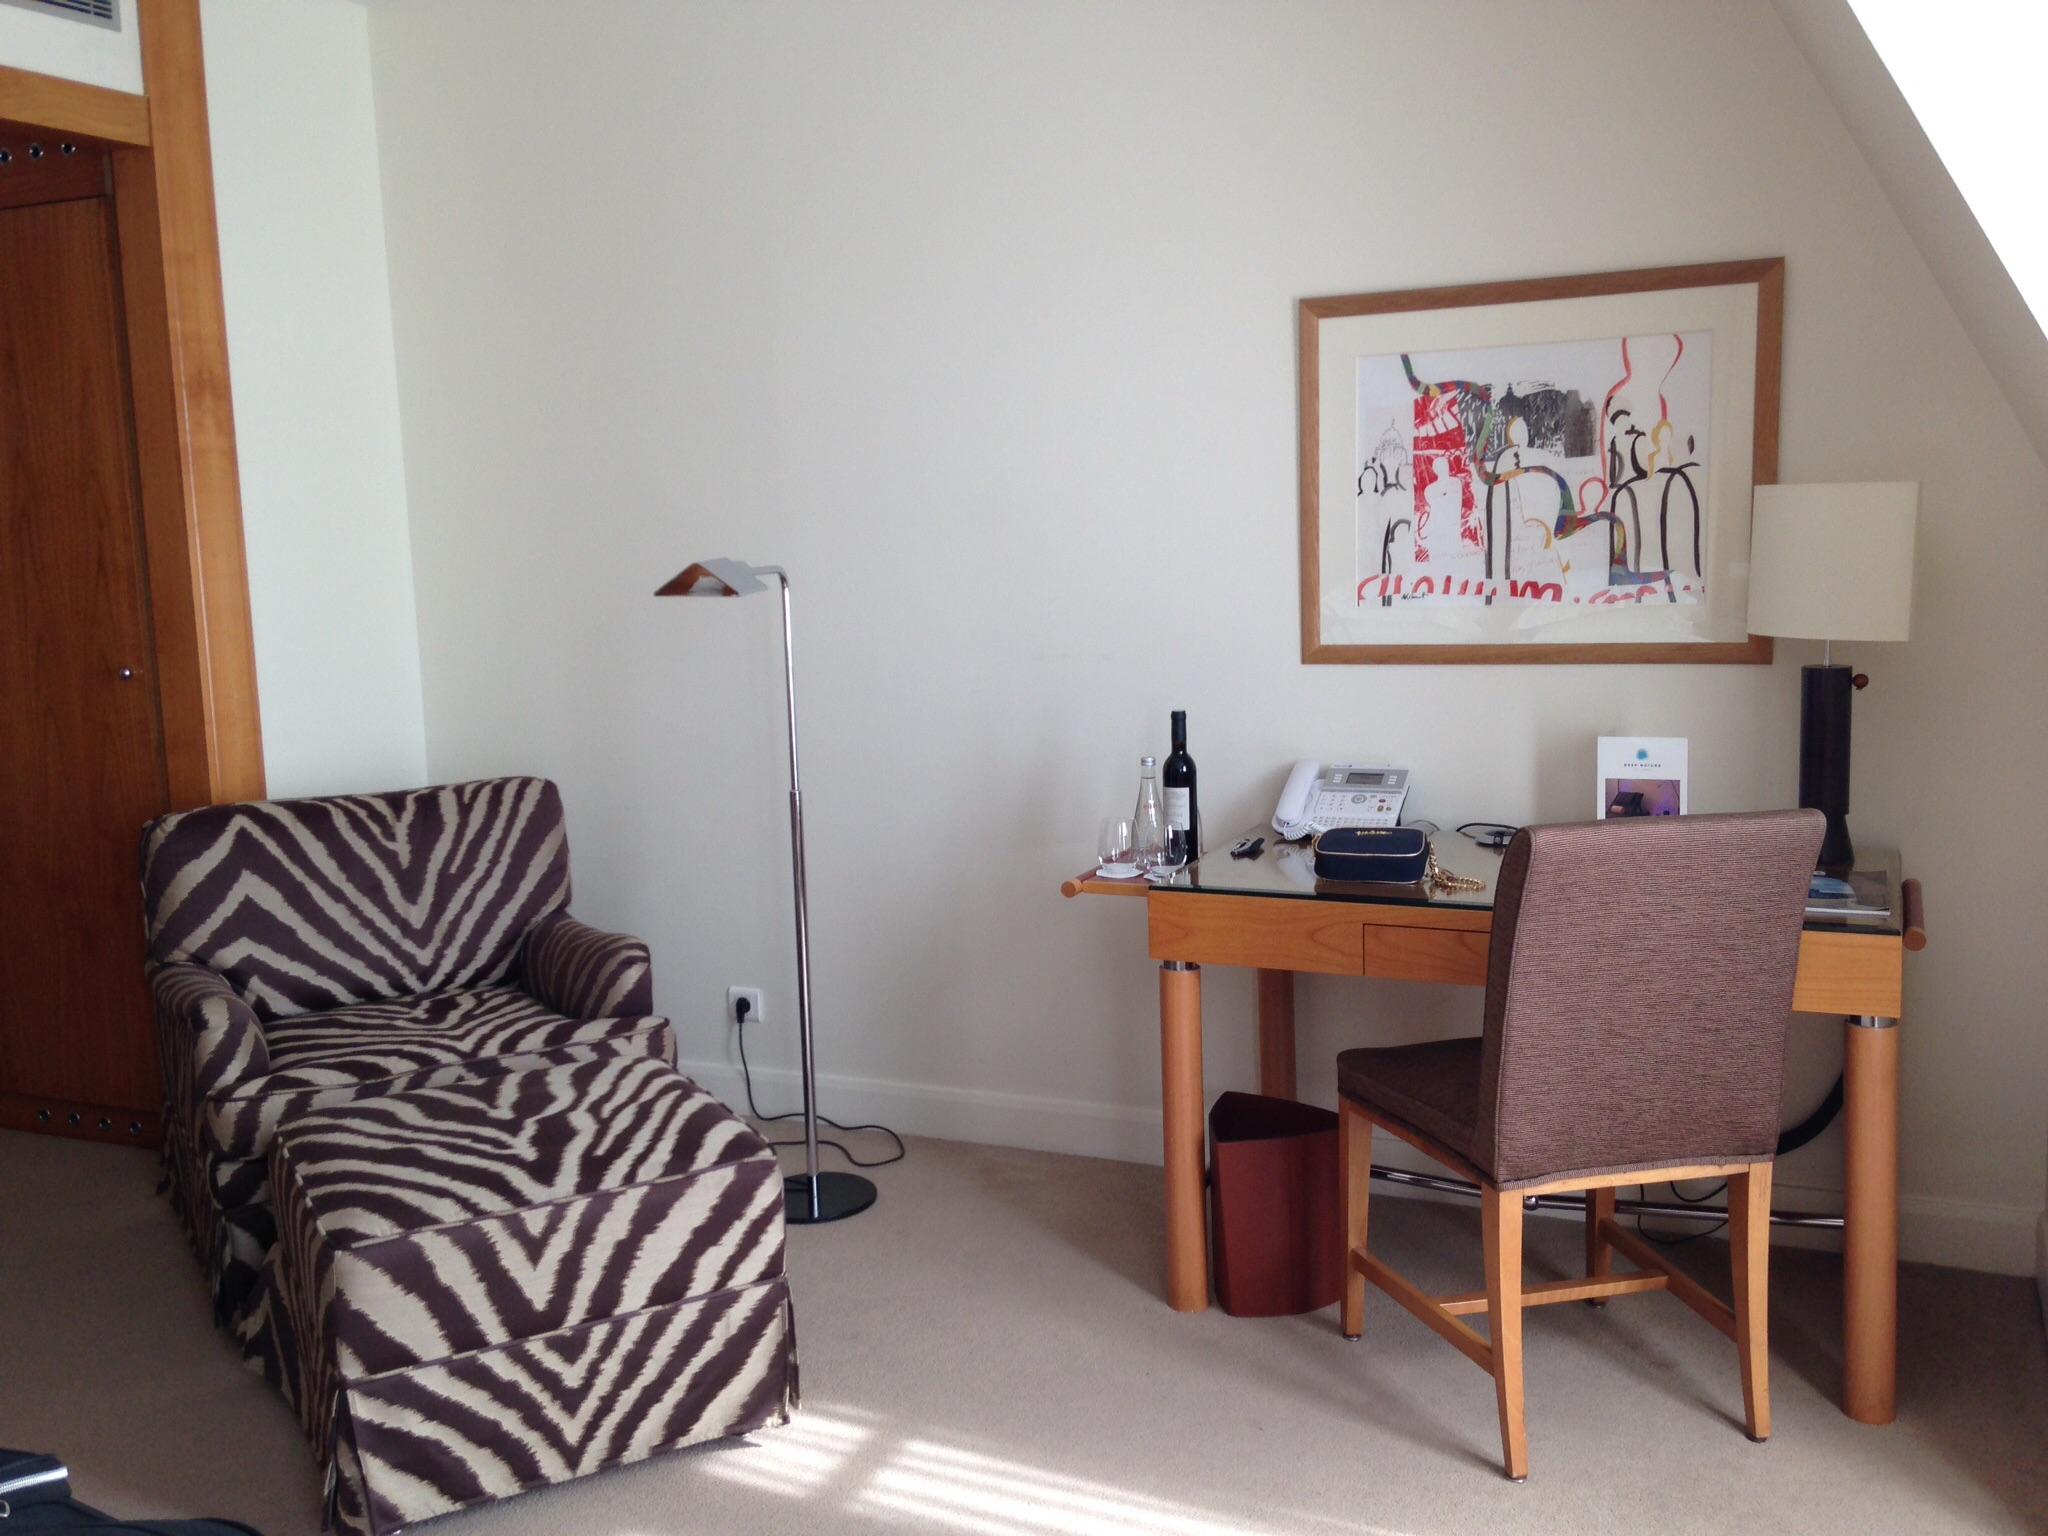 madeleine side chair review muji floor uk hotel hyatt paris